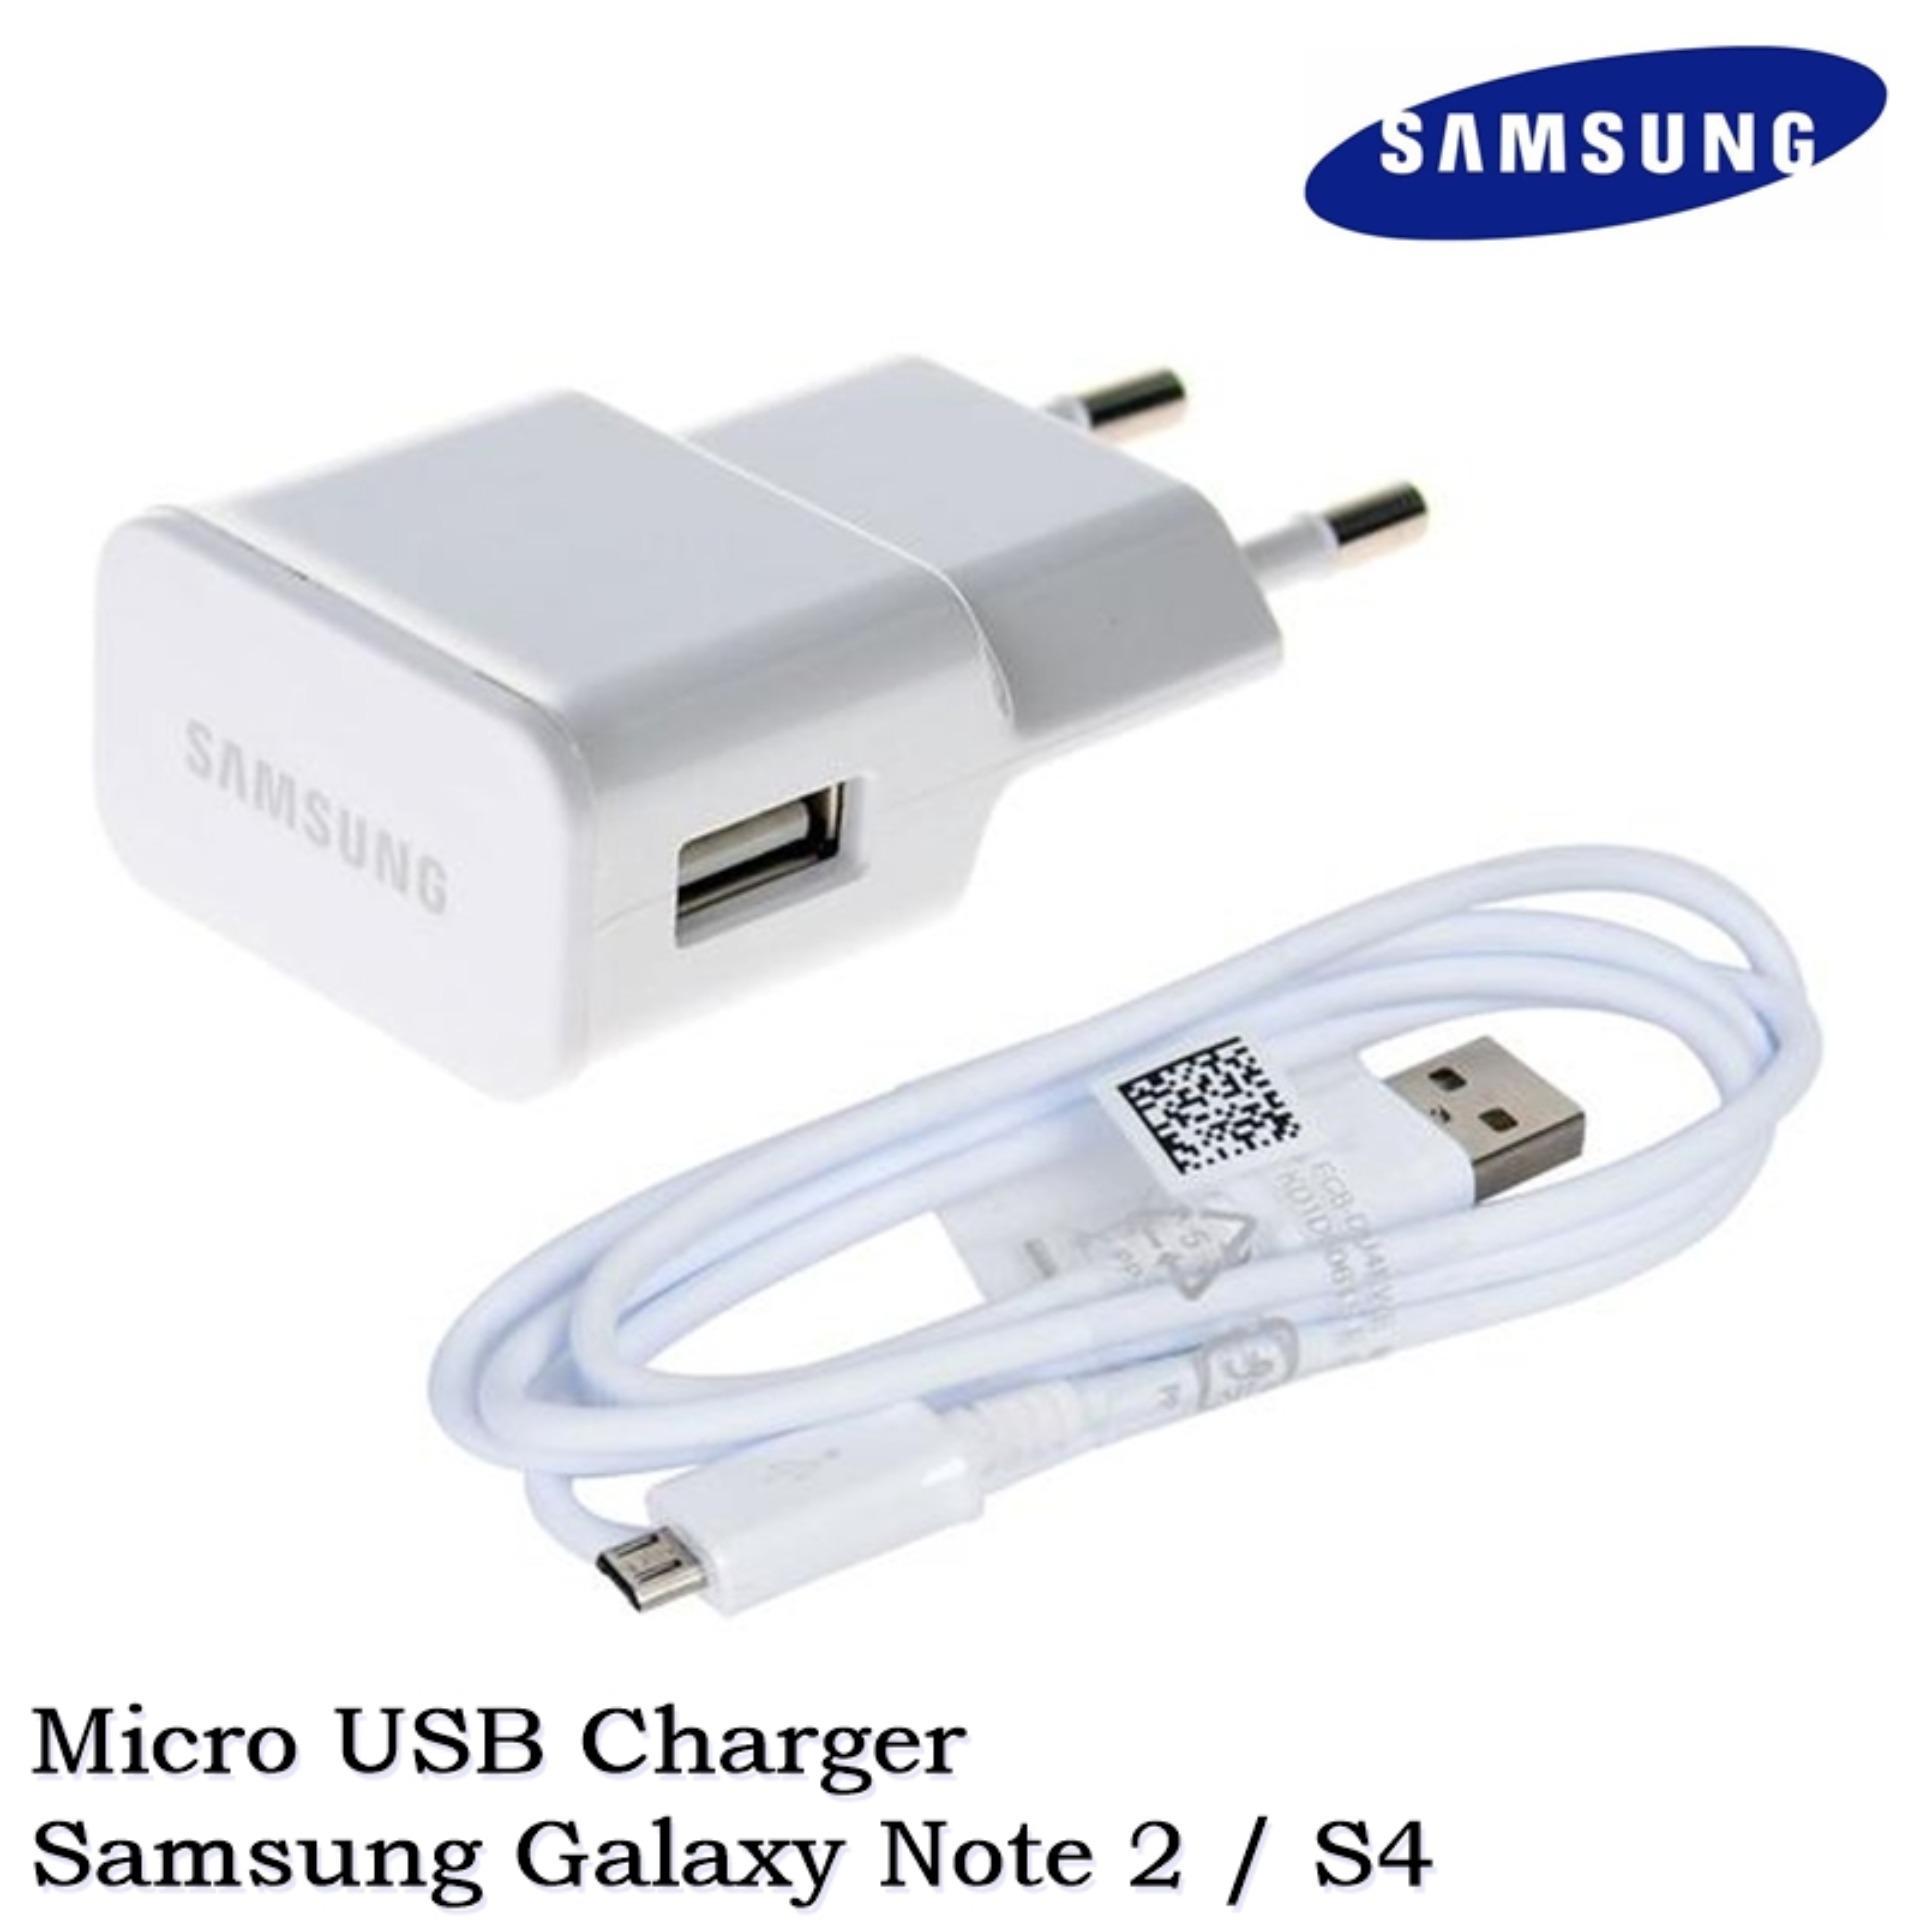 Samsung Charger Galaxy S3/4/5/Note 2/Grand/A3/5/E5/7 - Original